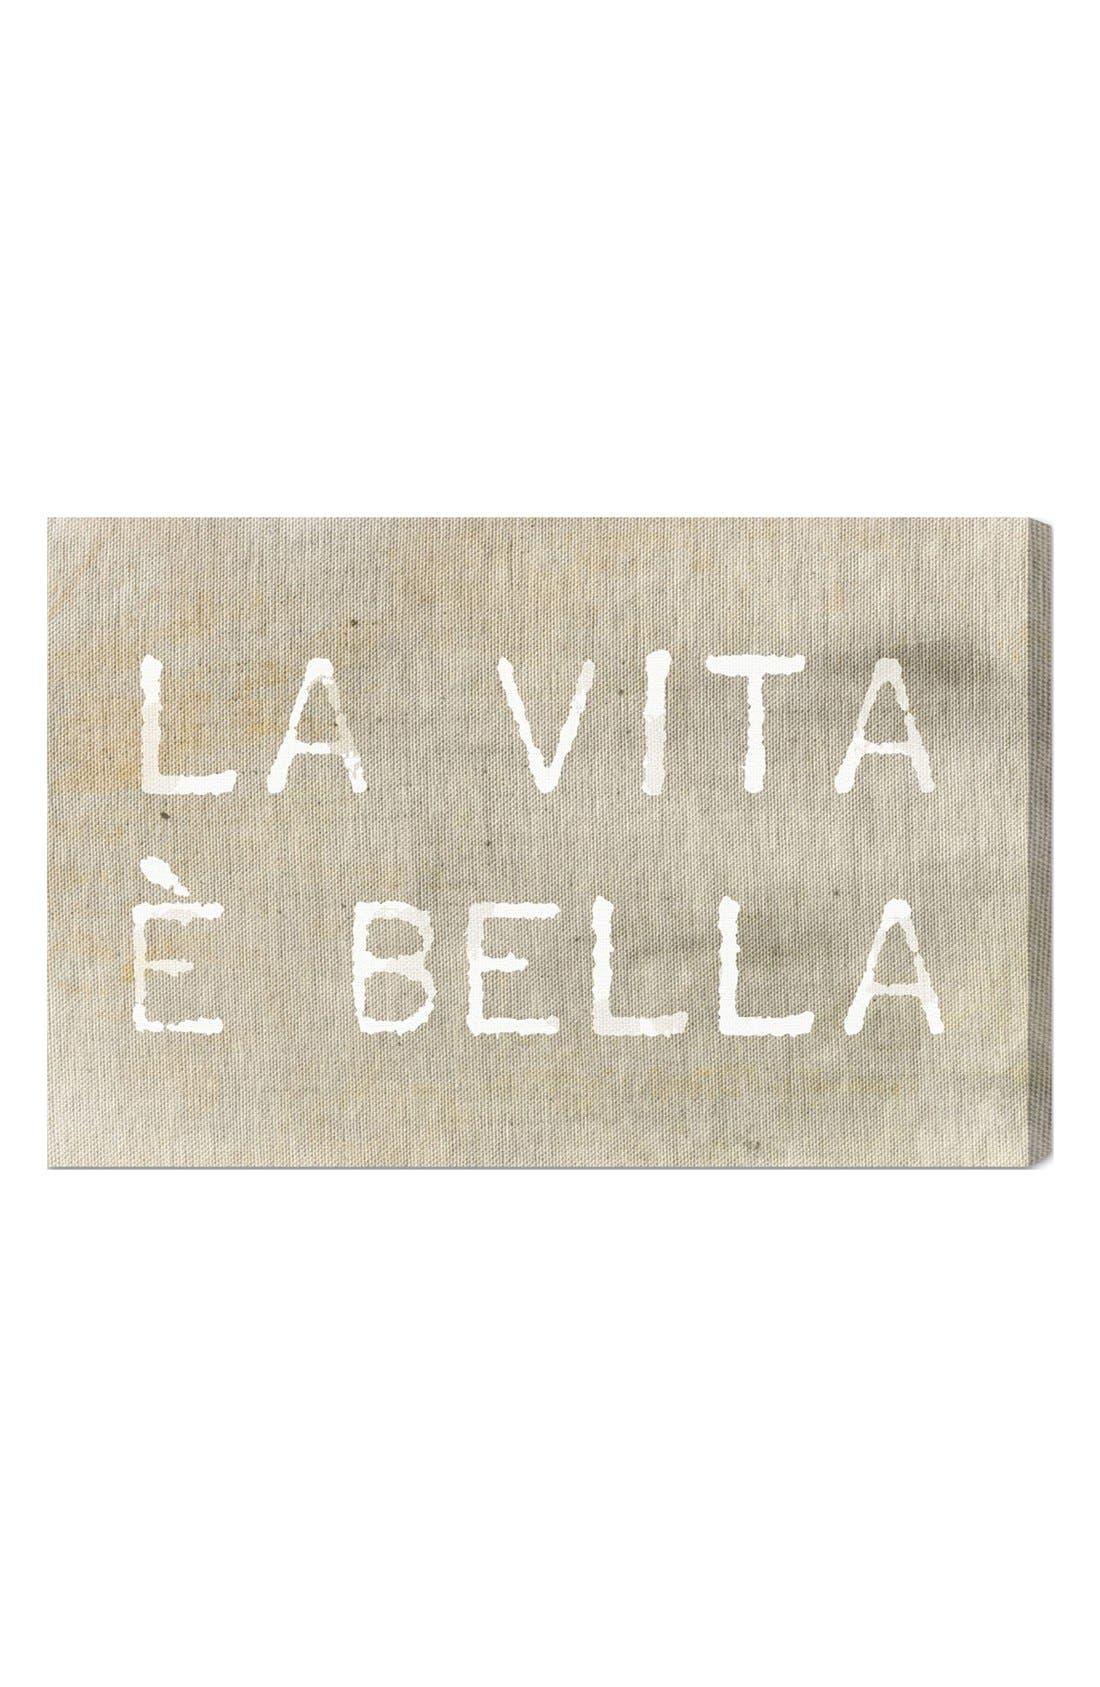 'La Vita È Bella' Wall Art,                             Main thumbnail 1, color,                             Beige/ Khaki